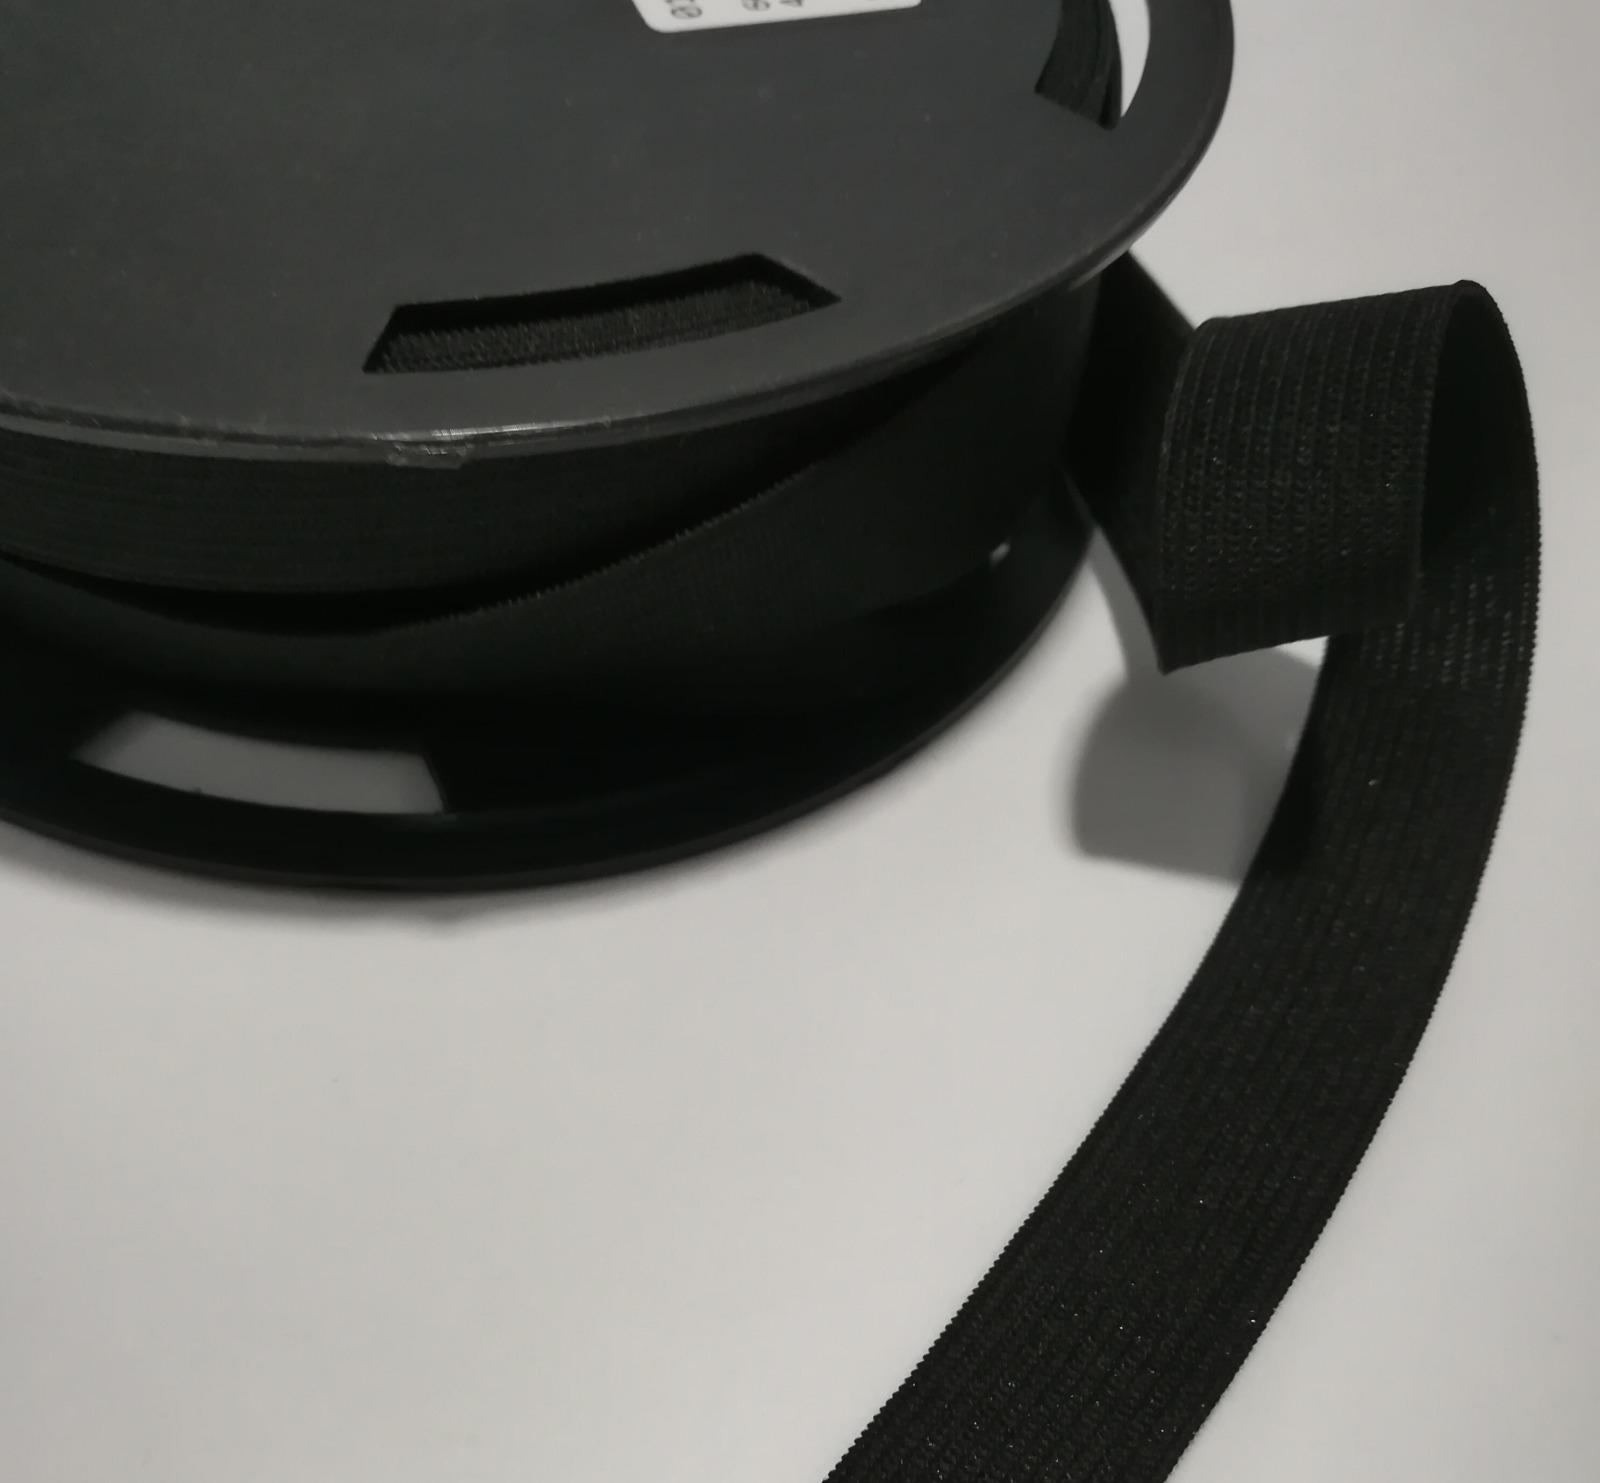 Flachgummi 2cm breit schwarz